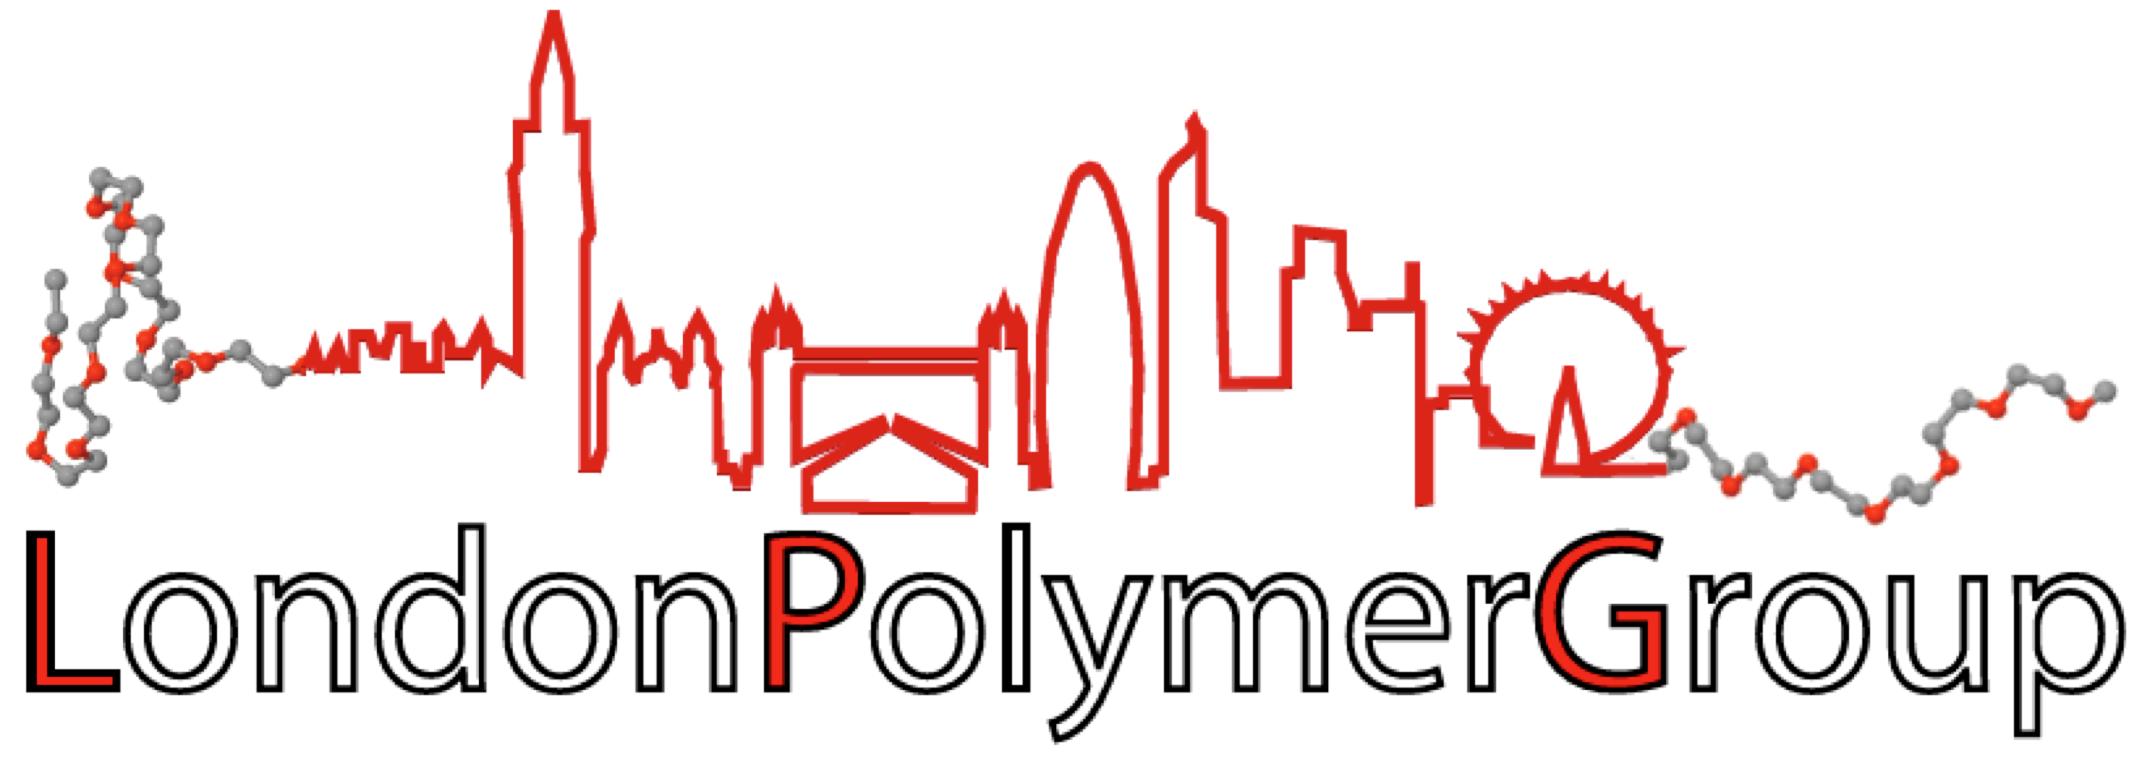 lodon polymer group